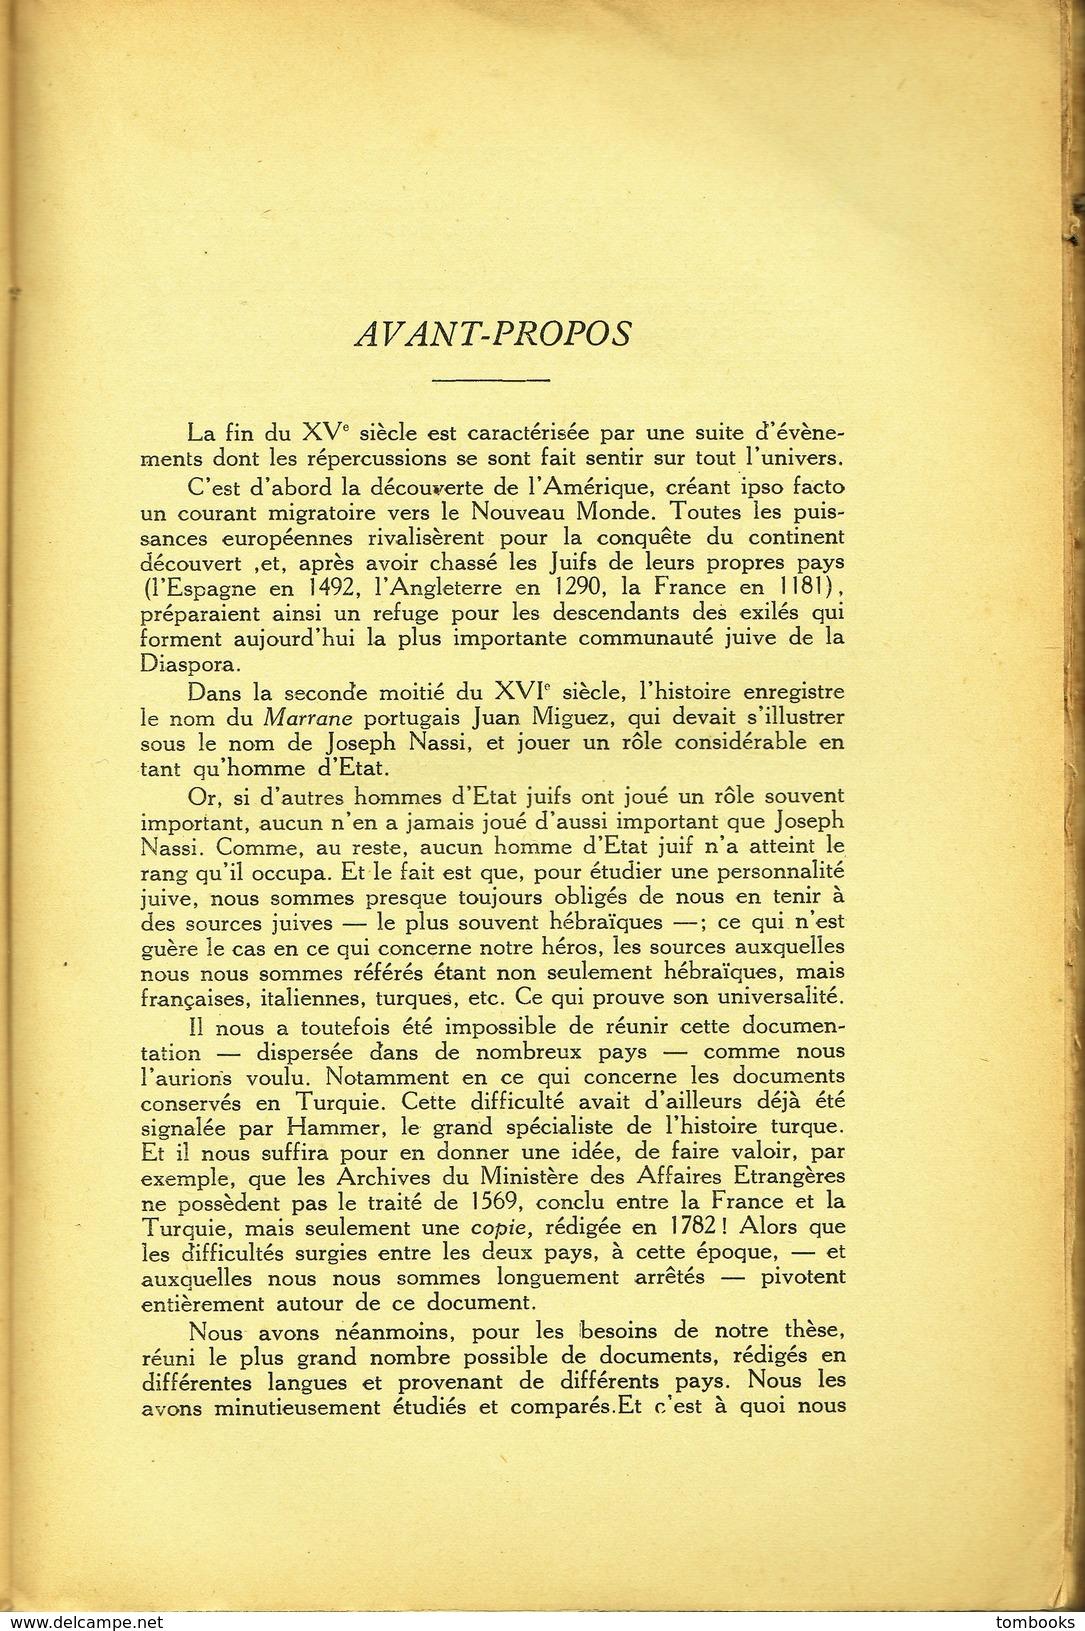 Le Duc Joseph De Naxos - Livre - Contribution à L'Histoire Juive Du XVI E Siècle - Jacob Reznik ( J . Ha - Rosin ) 1936 - Religion